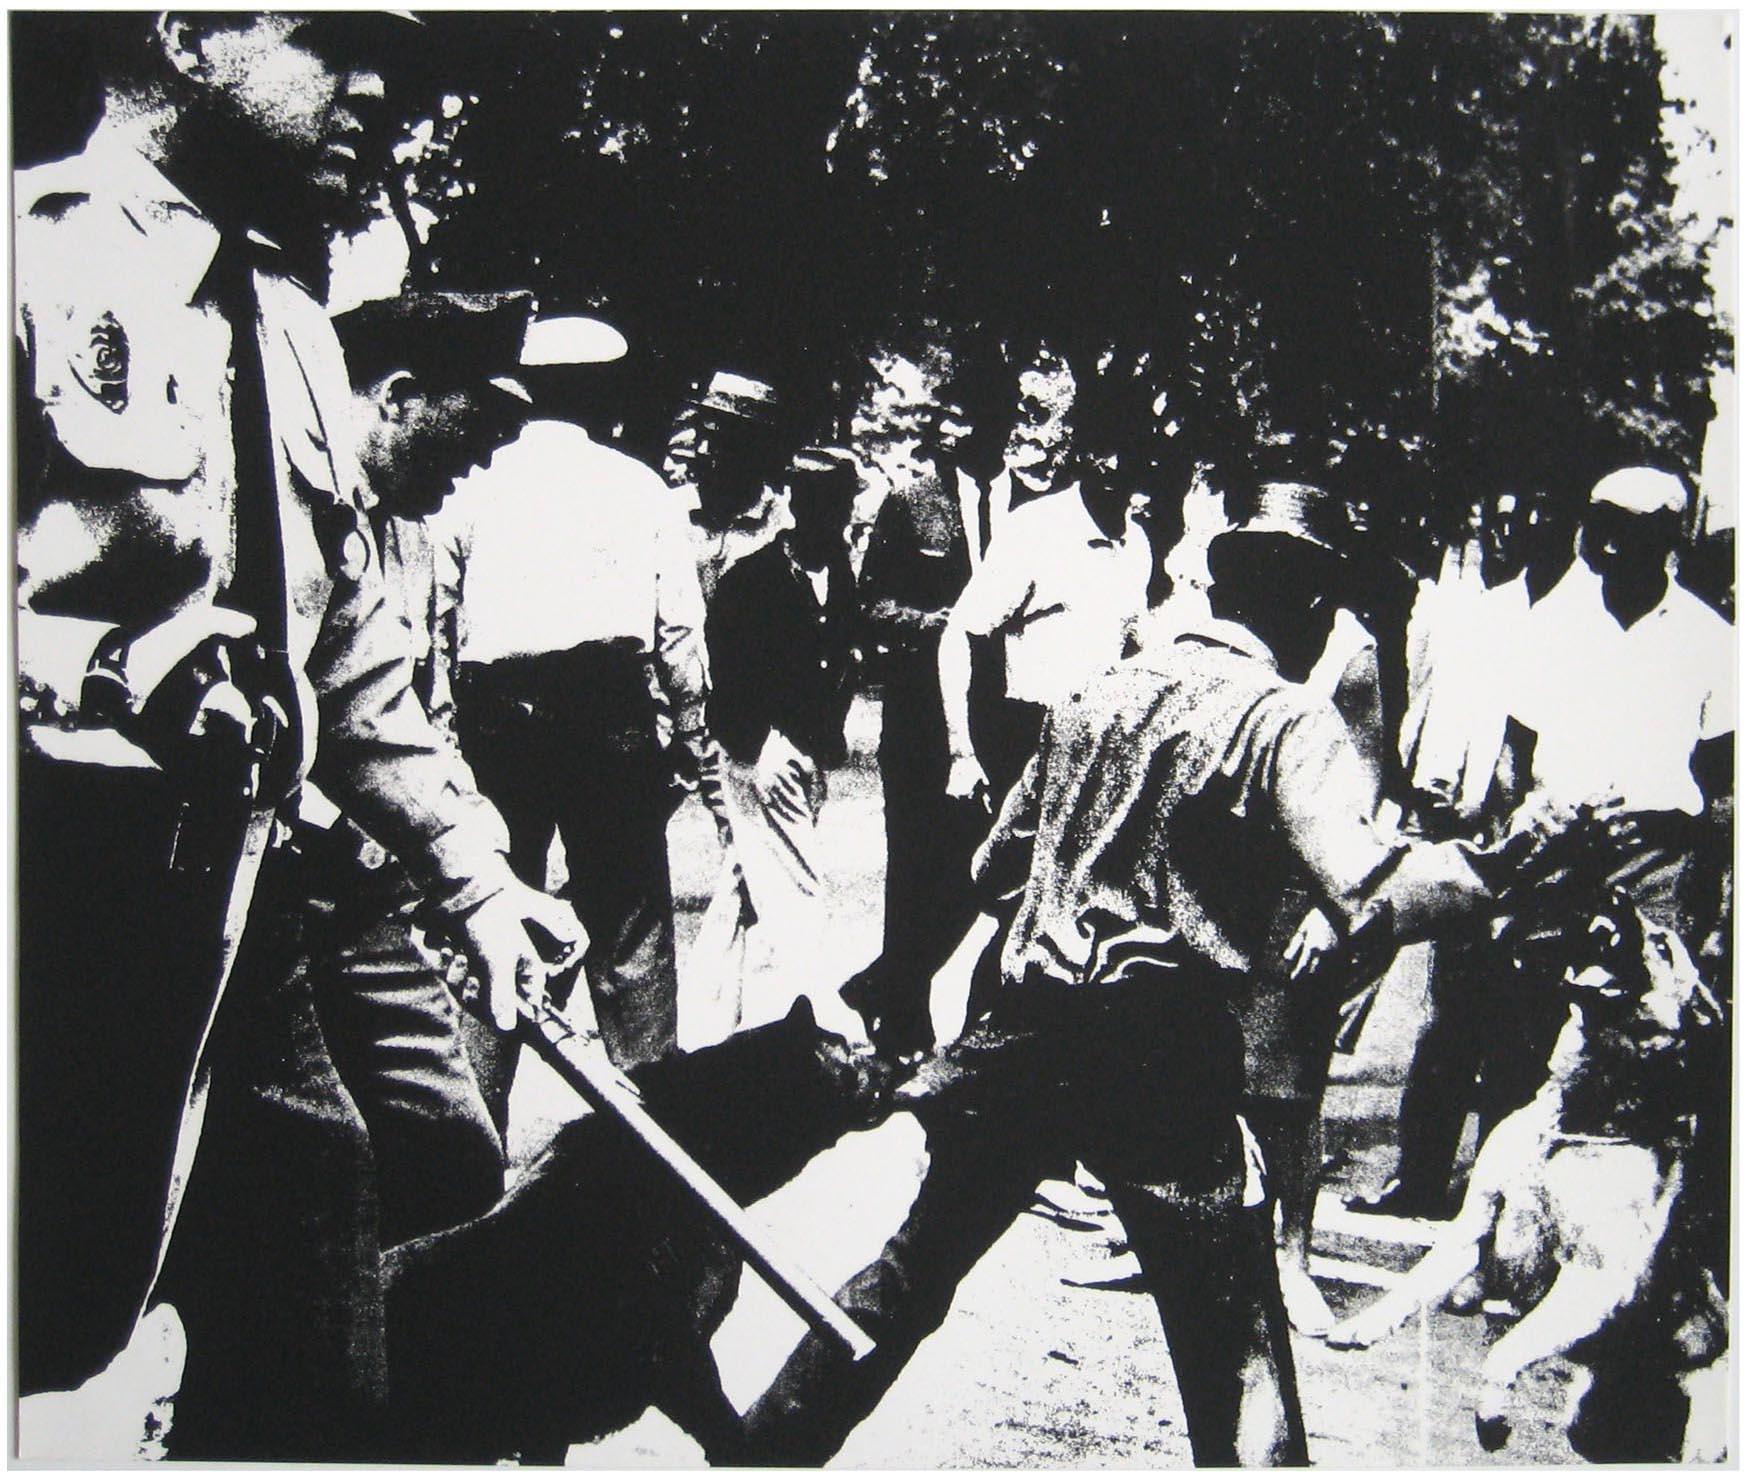 Warhol - 1964 - Birmingham Race Riot, II.3